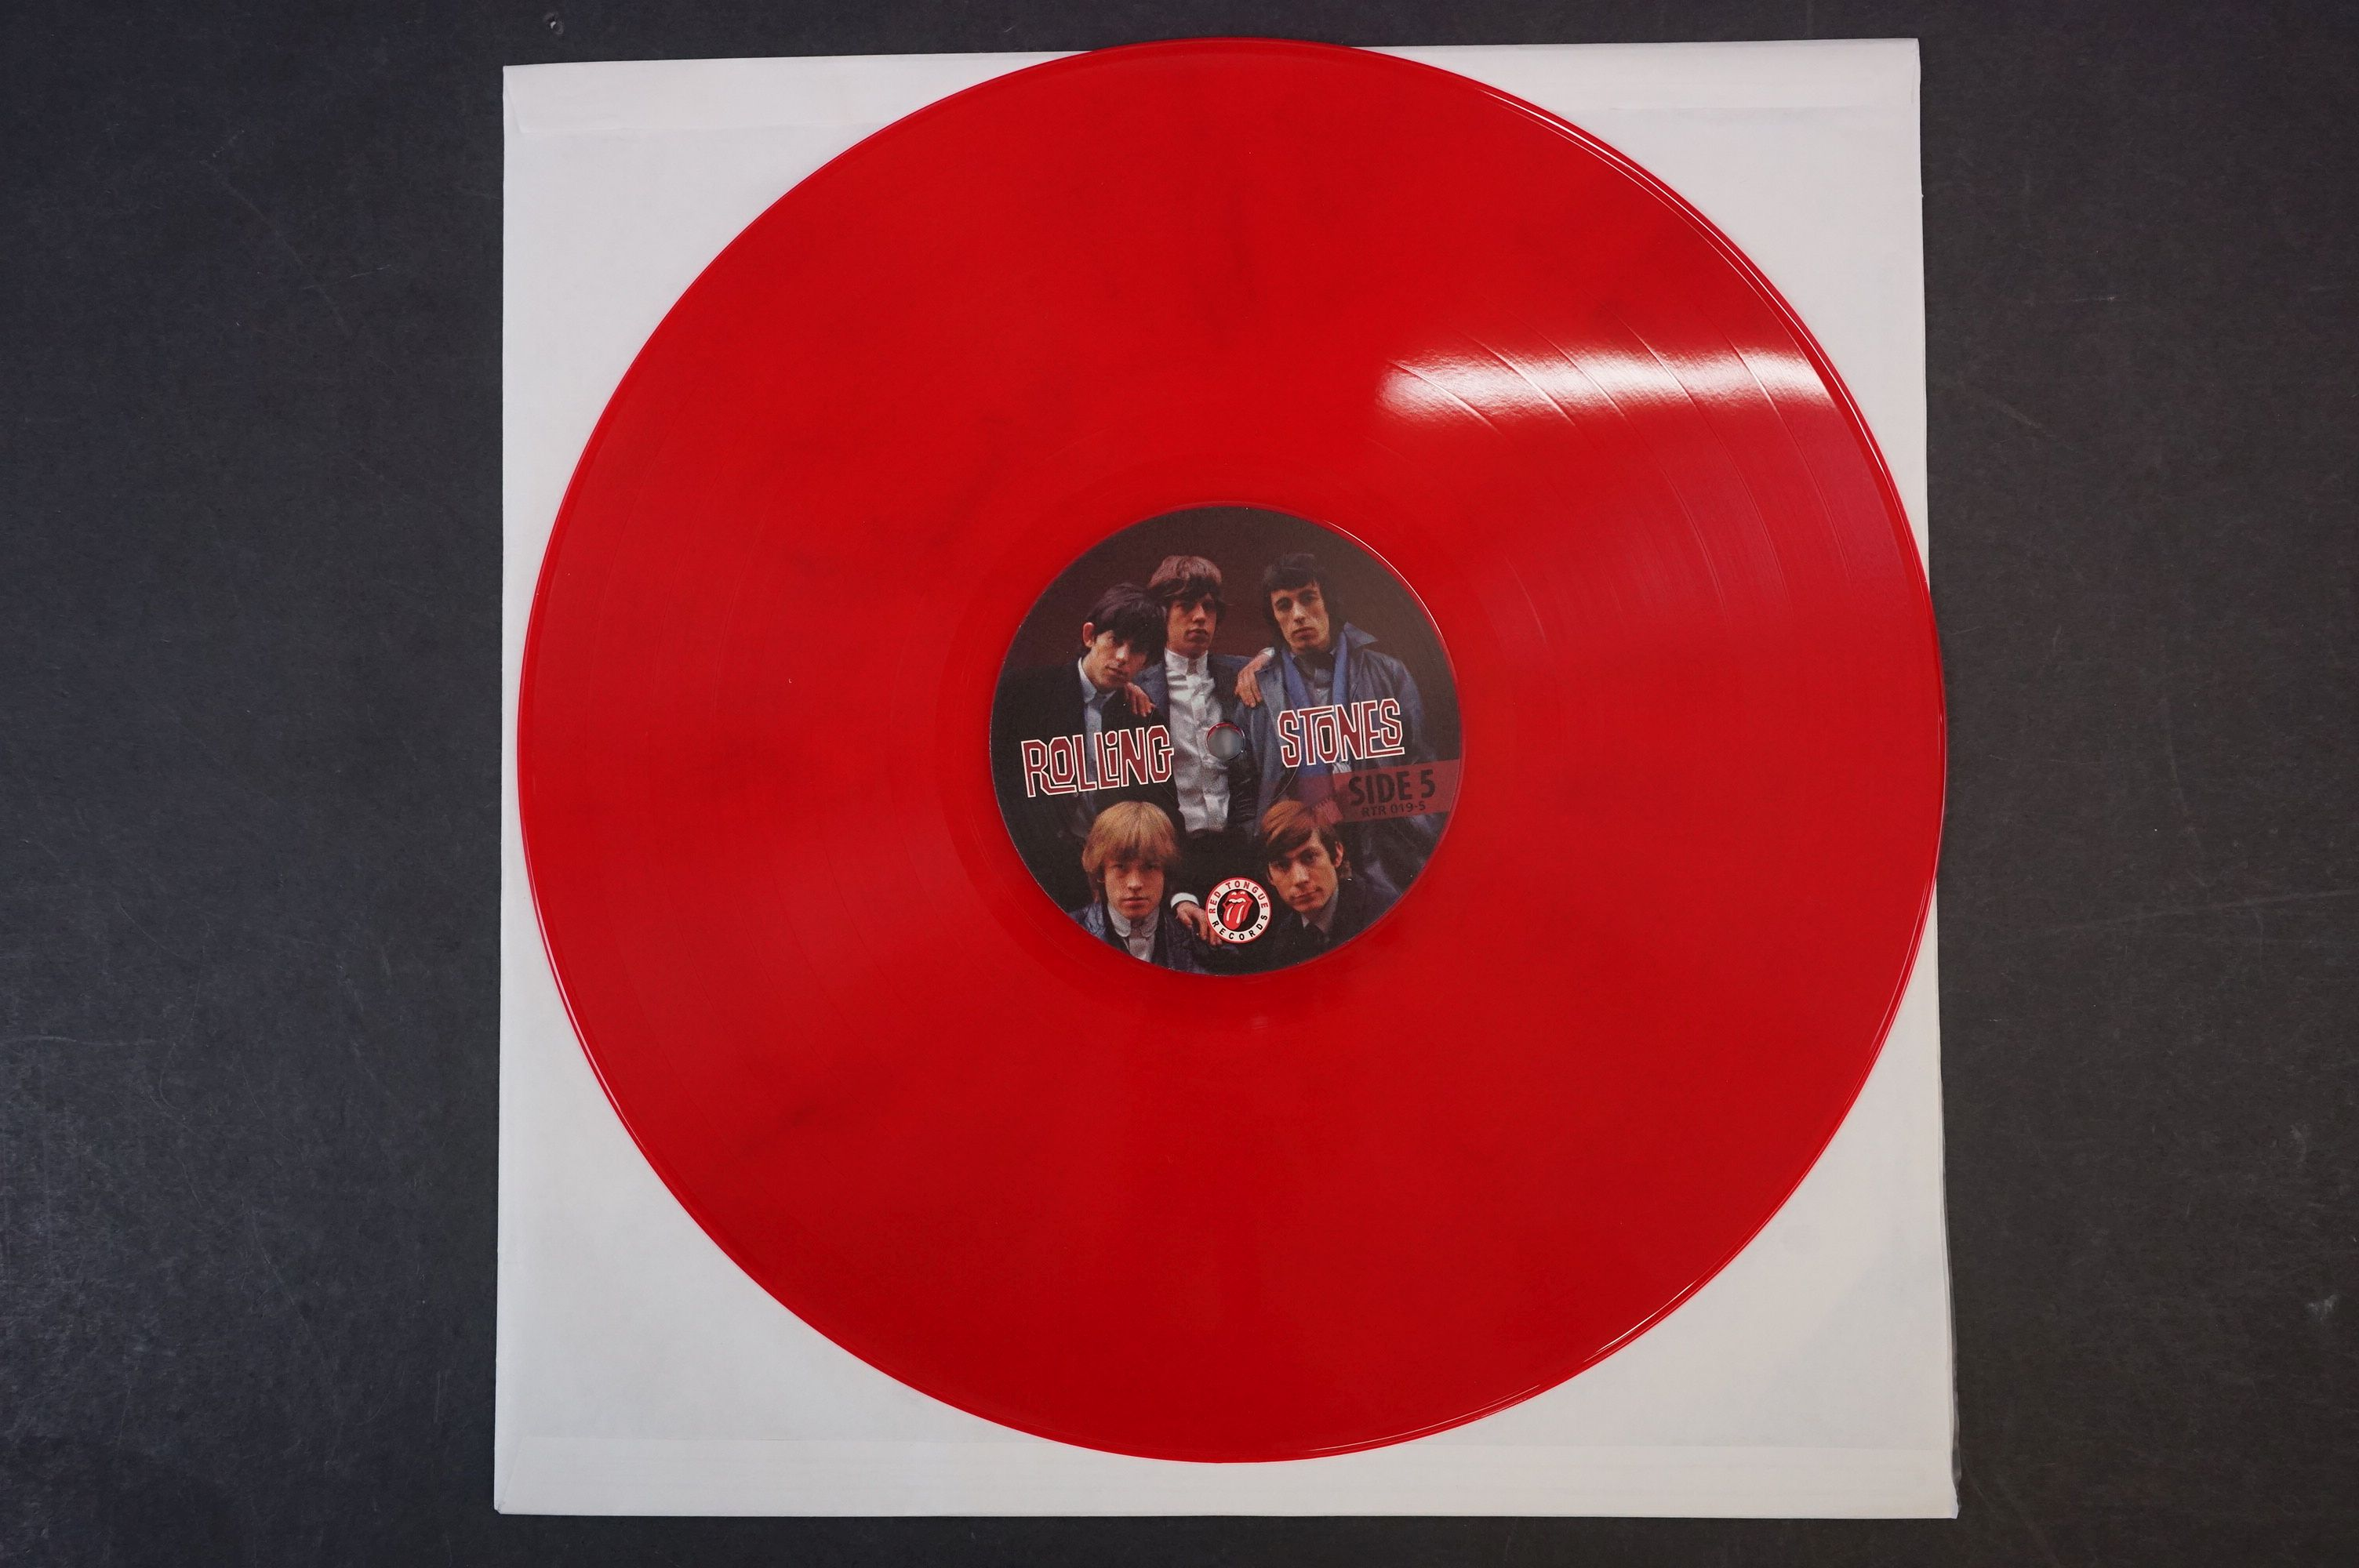 Vinyl - ltd edn The Rolling Stones The Brian Jones Years 5 LP / 3 CD Box Set RTR019, heavy - Image 7 of 12